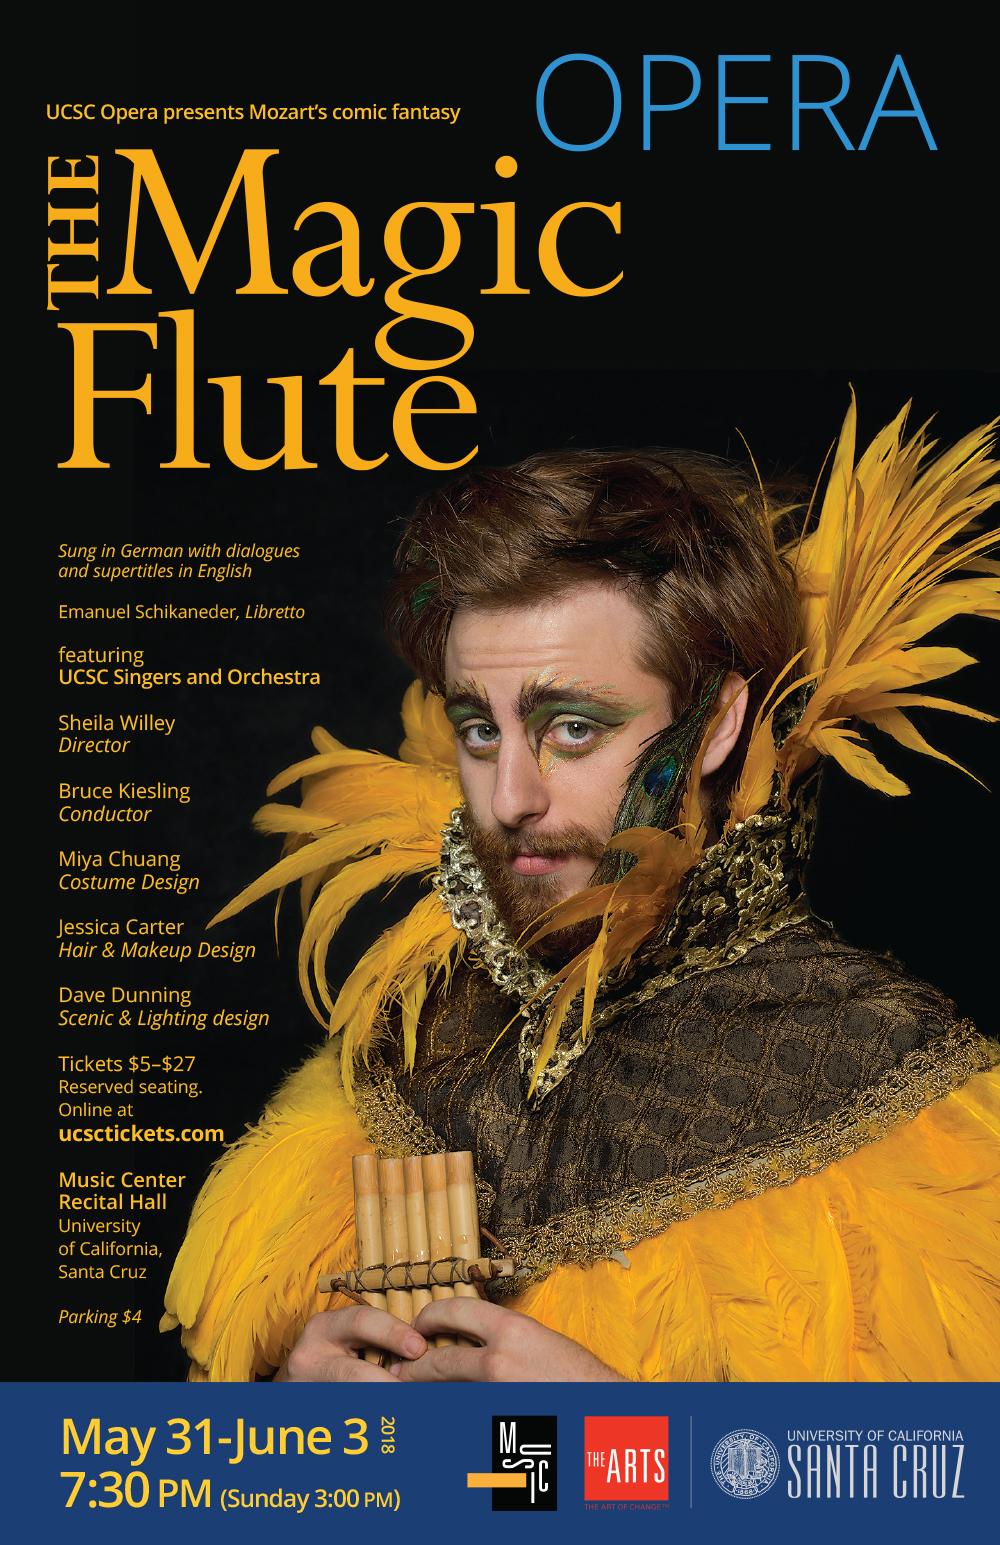 Magic Flute opera poster